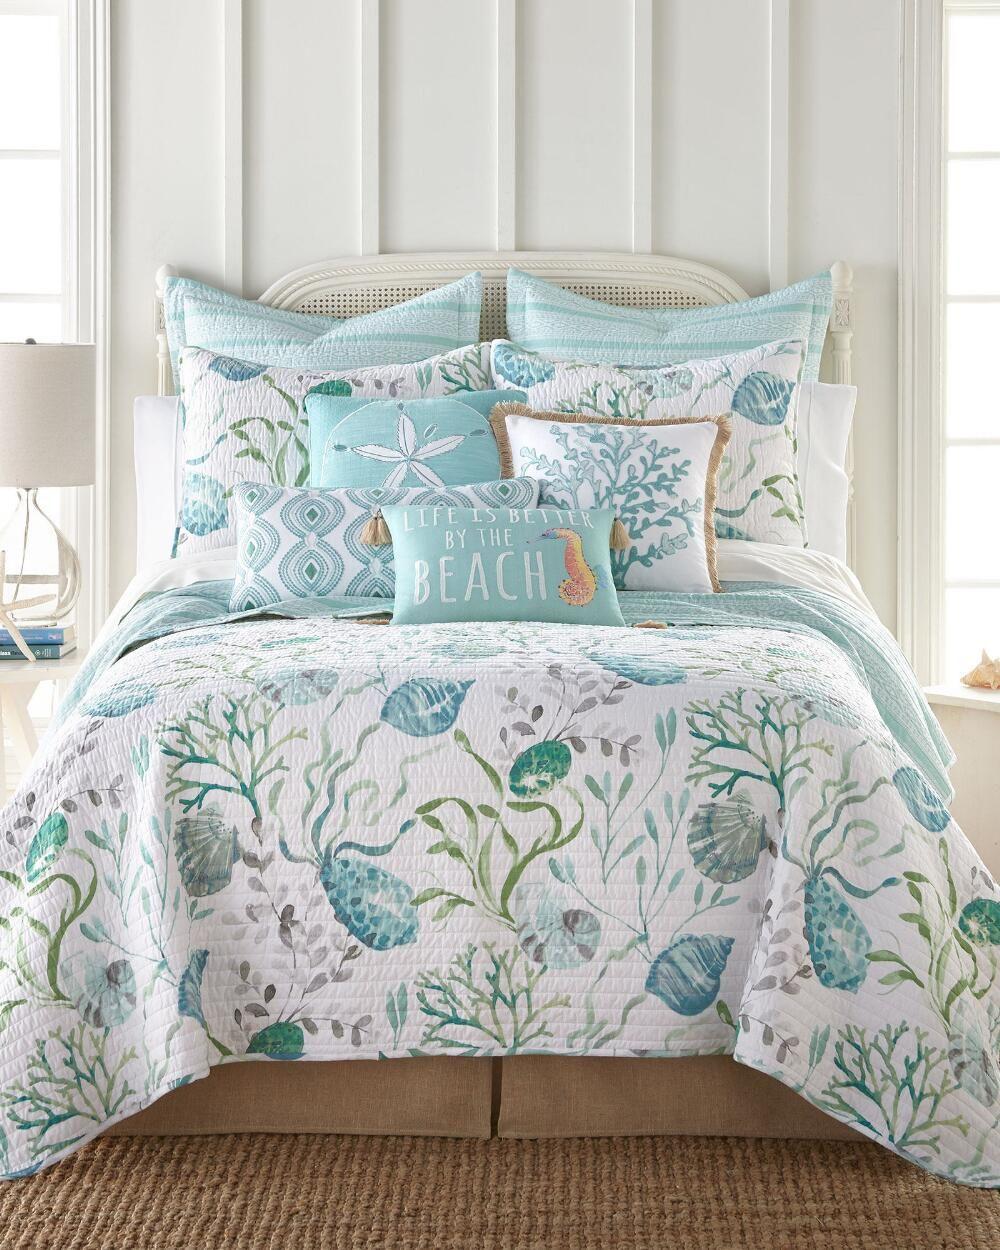 Grand Cayman Teal Luxury Quilt Coastal bedrooms, Bedroom